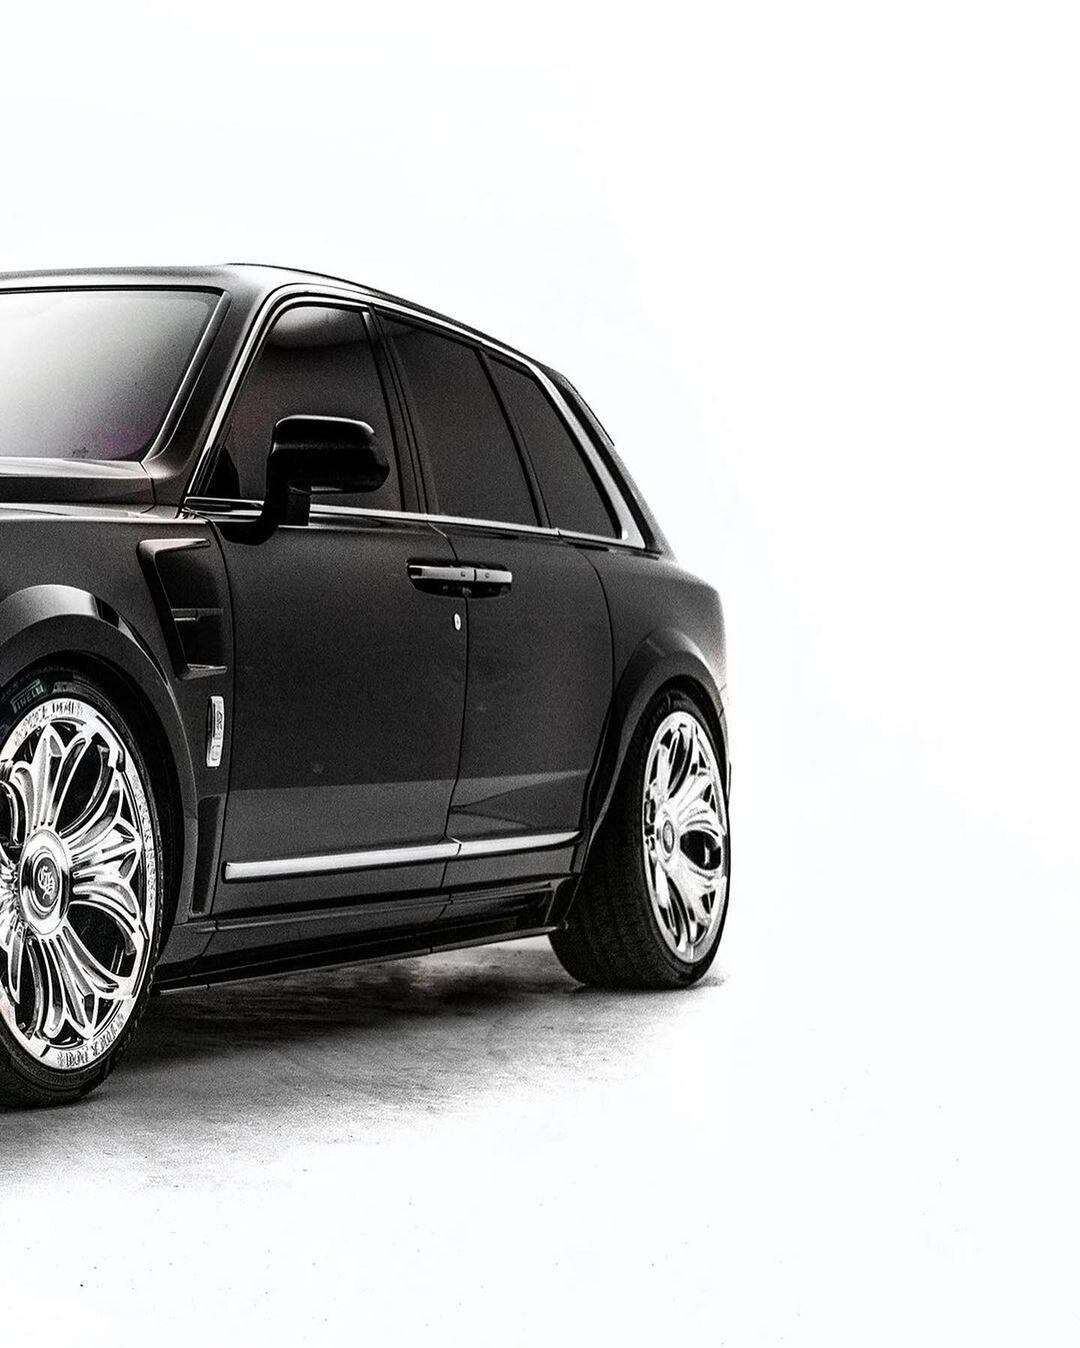 Drake Chrome Hearts - Mansory Rolls Royce